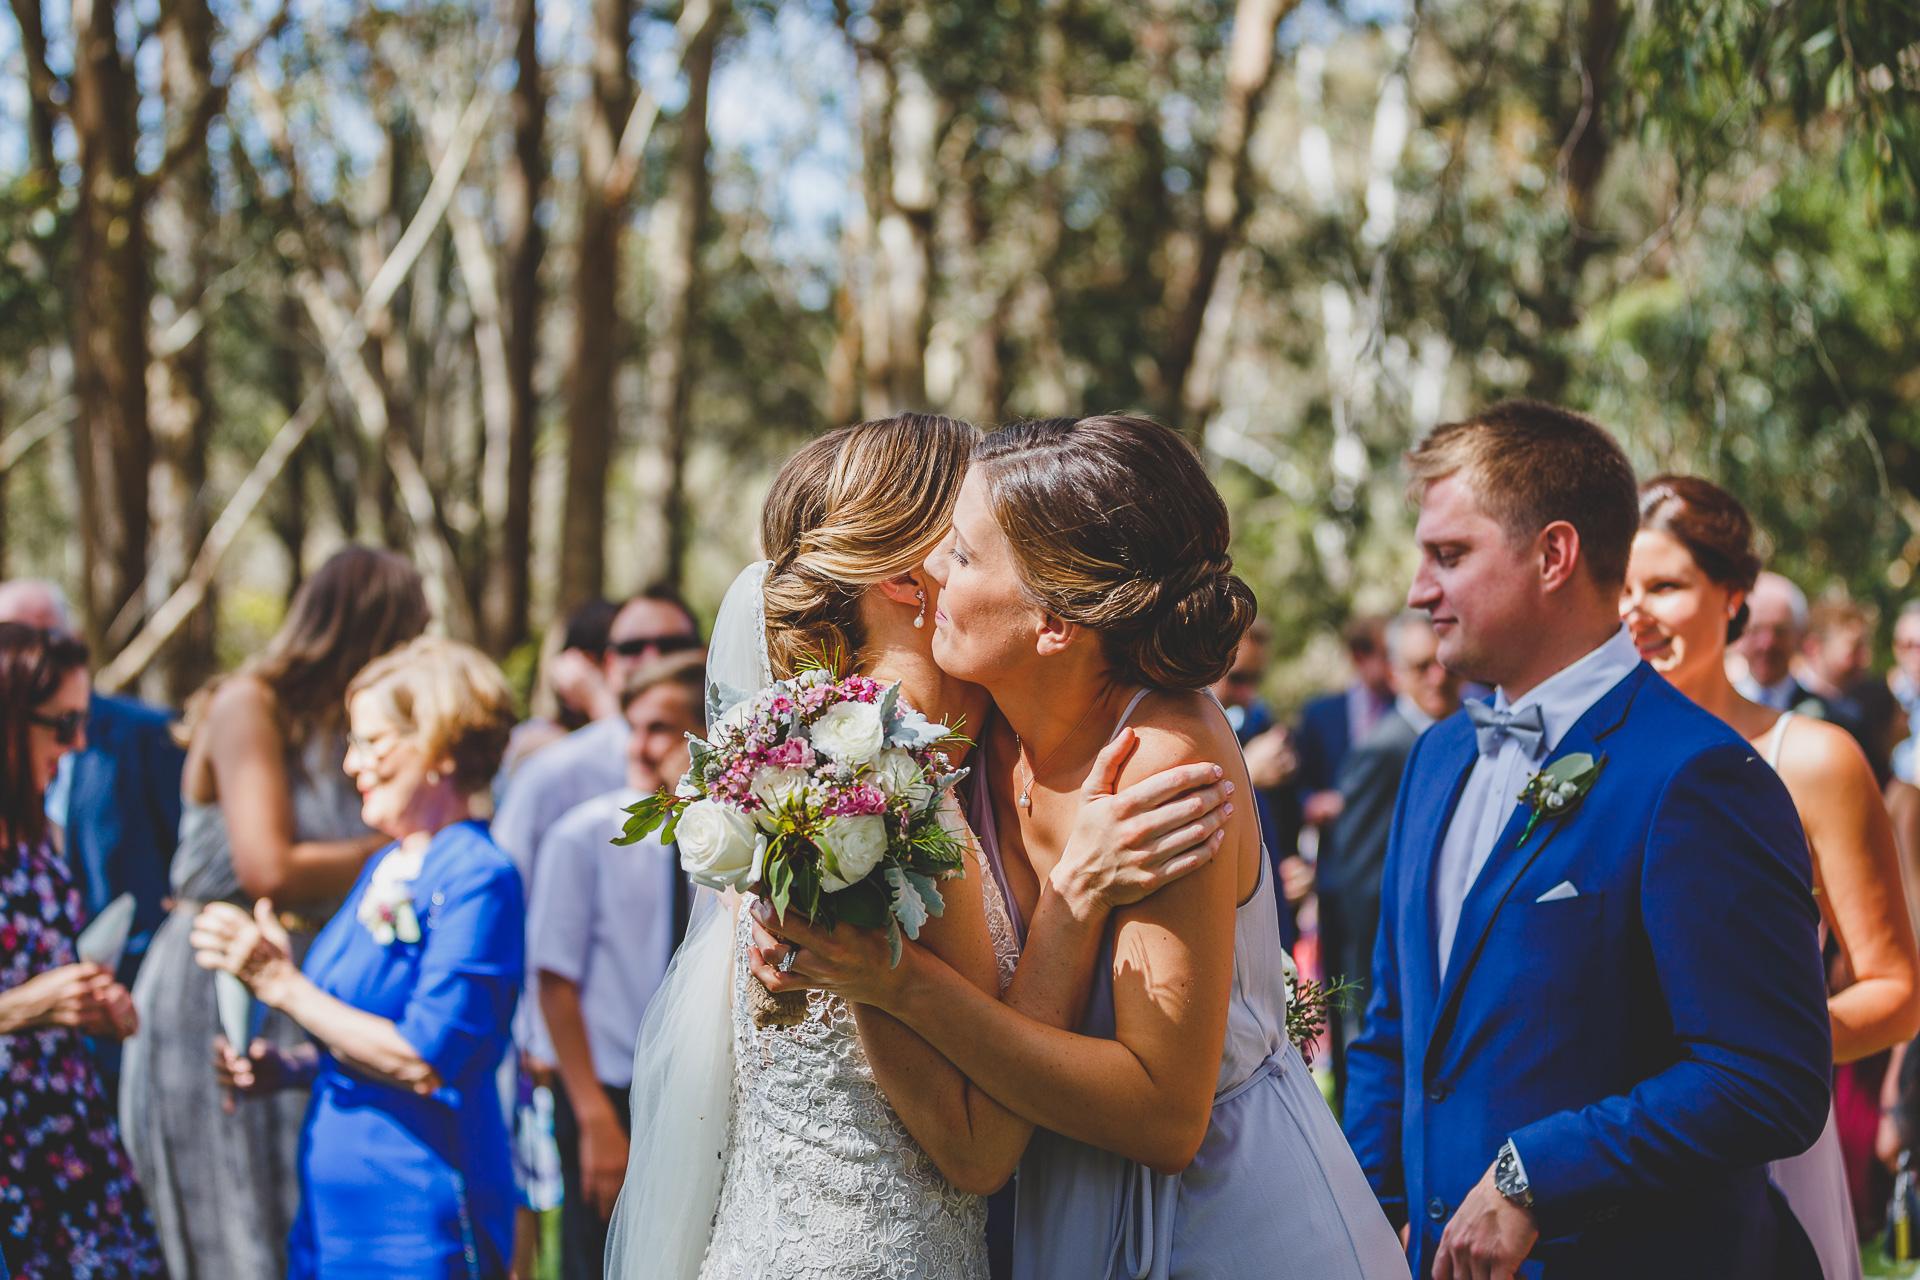 20161112 - Heath_Ruth_Wombat_Hollow_Wedding | 237.jpg